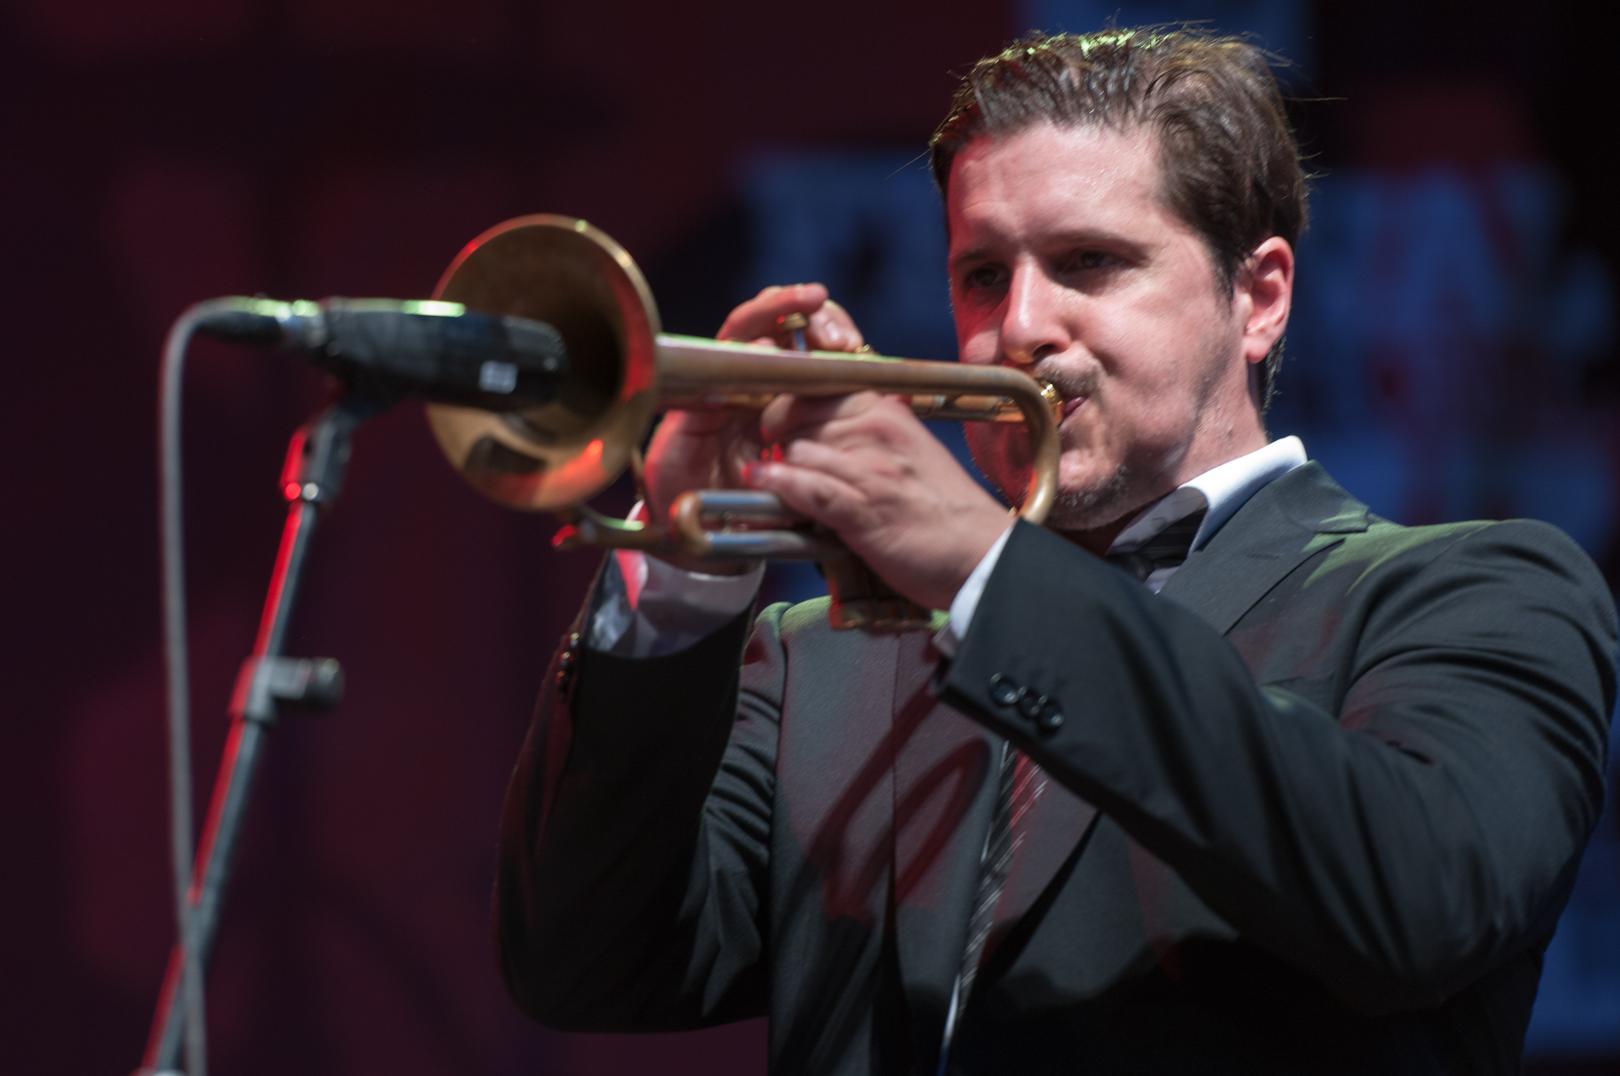 William Sperandei with Tyler Yarema at the Montreal International Jazz Festival 2012